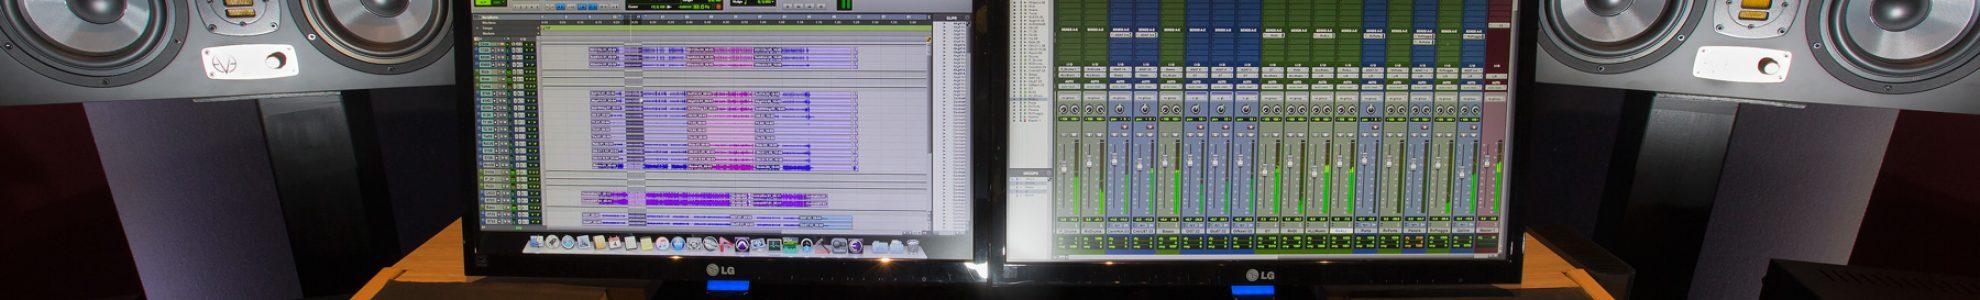 Power Light - Control Room - Ascolti